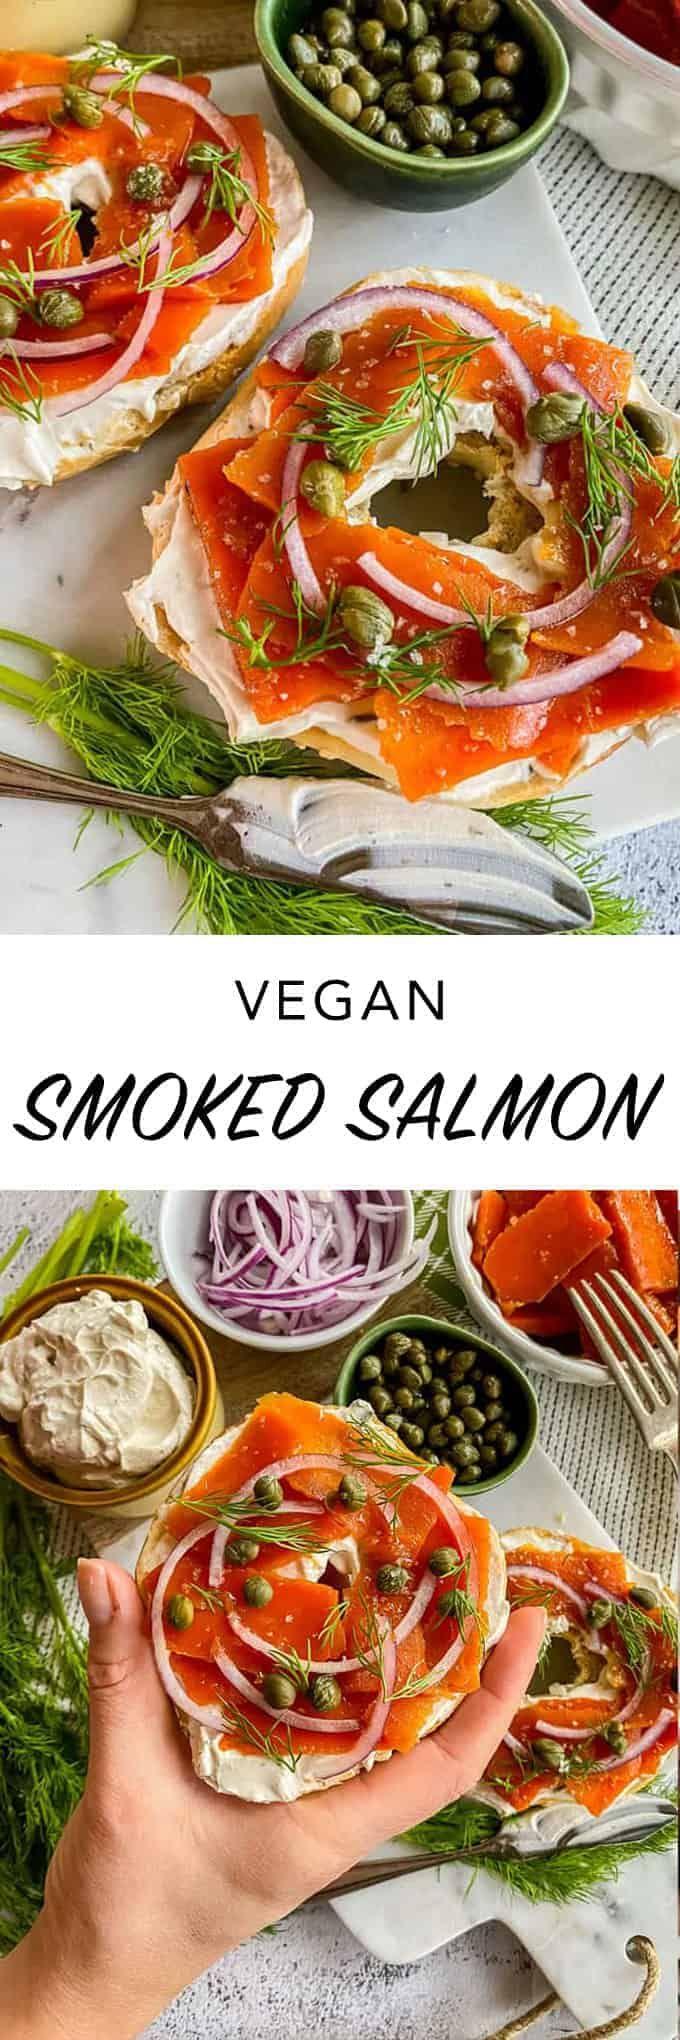 Vegan Smoked Salmon | Vegan Lox  #entreesrecettes